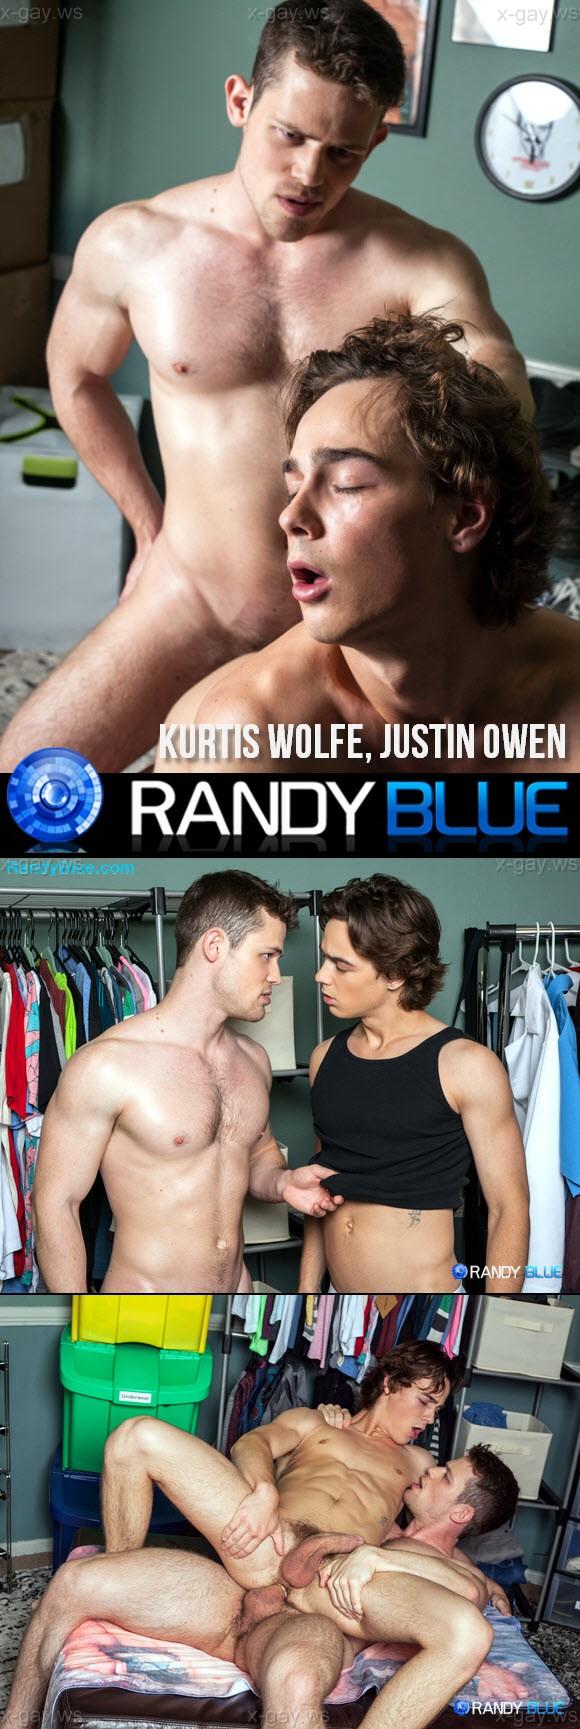 RandyBlue – Kurtis Wolfe & Justin Owen